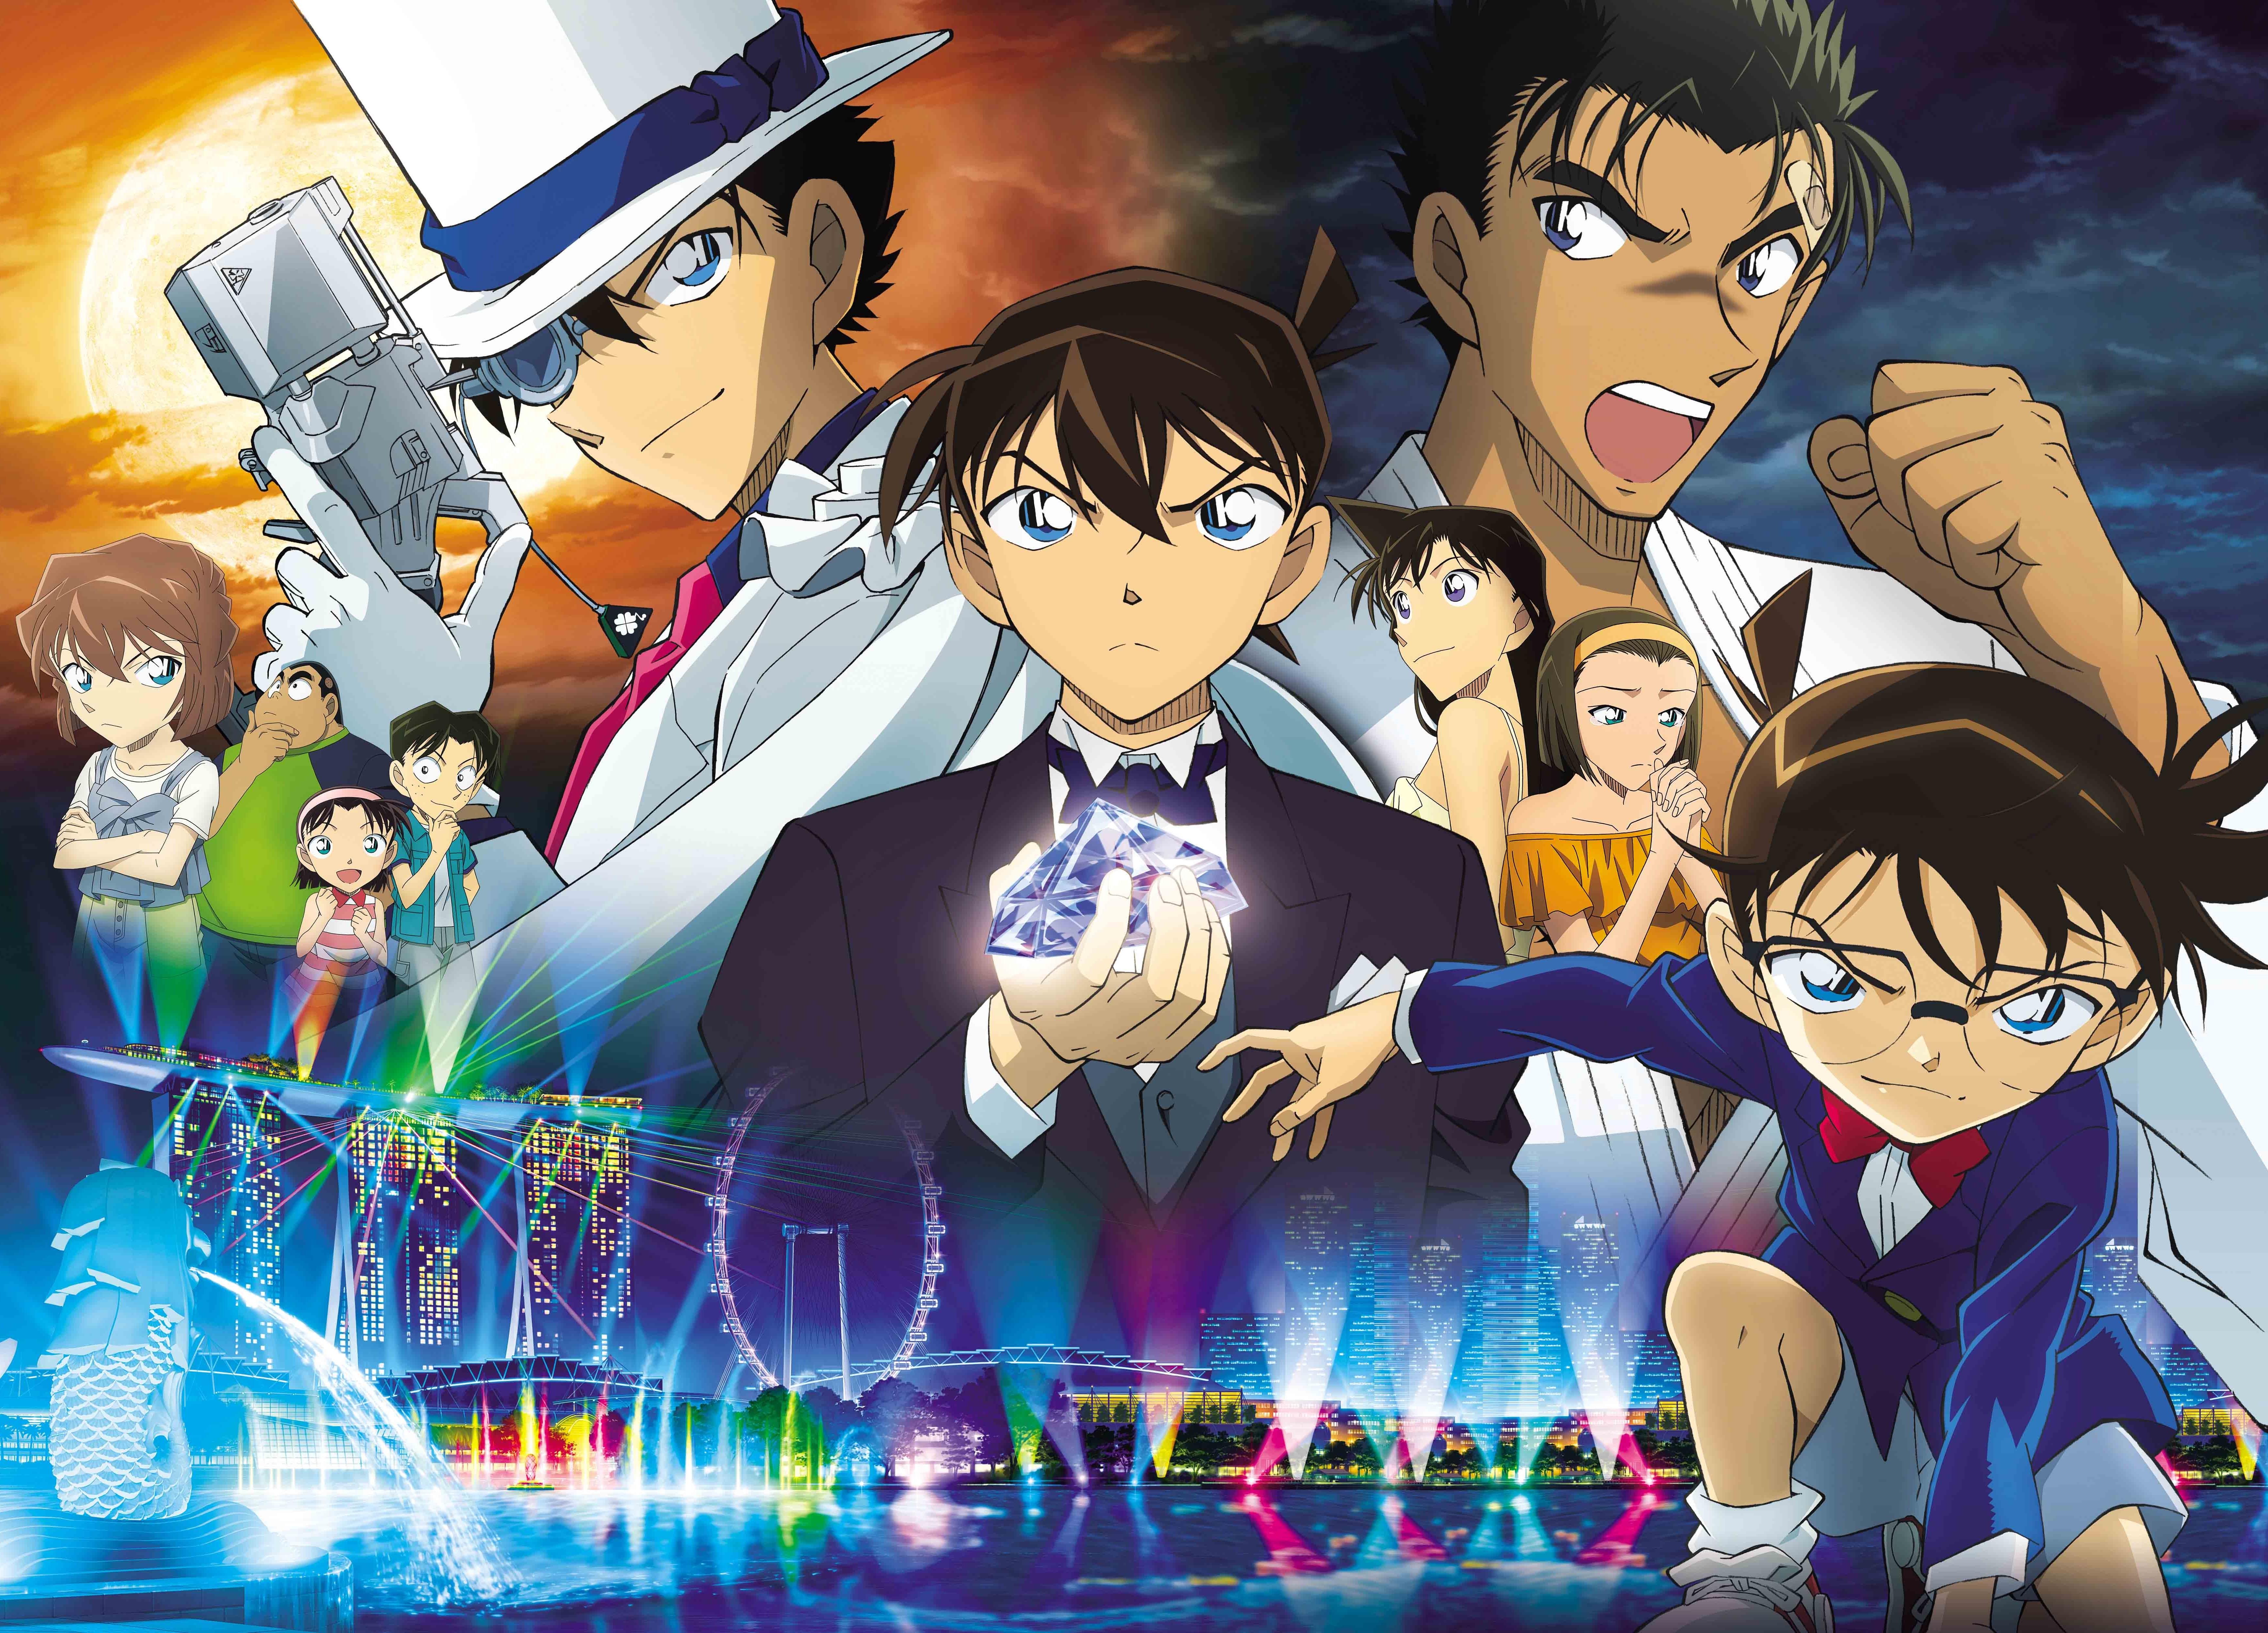 劇場版『名探偵コナン』興収収入91億円突破で7年連続記録更新